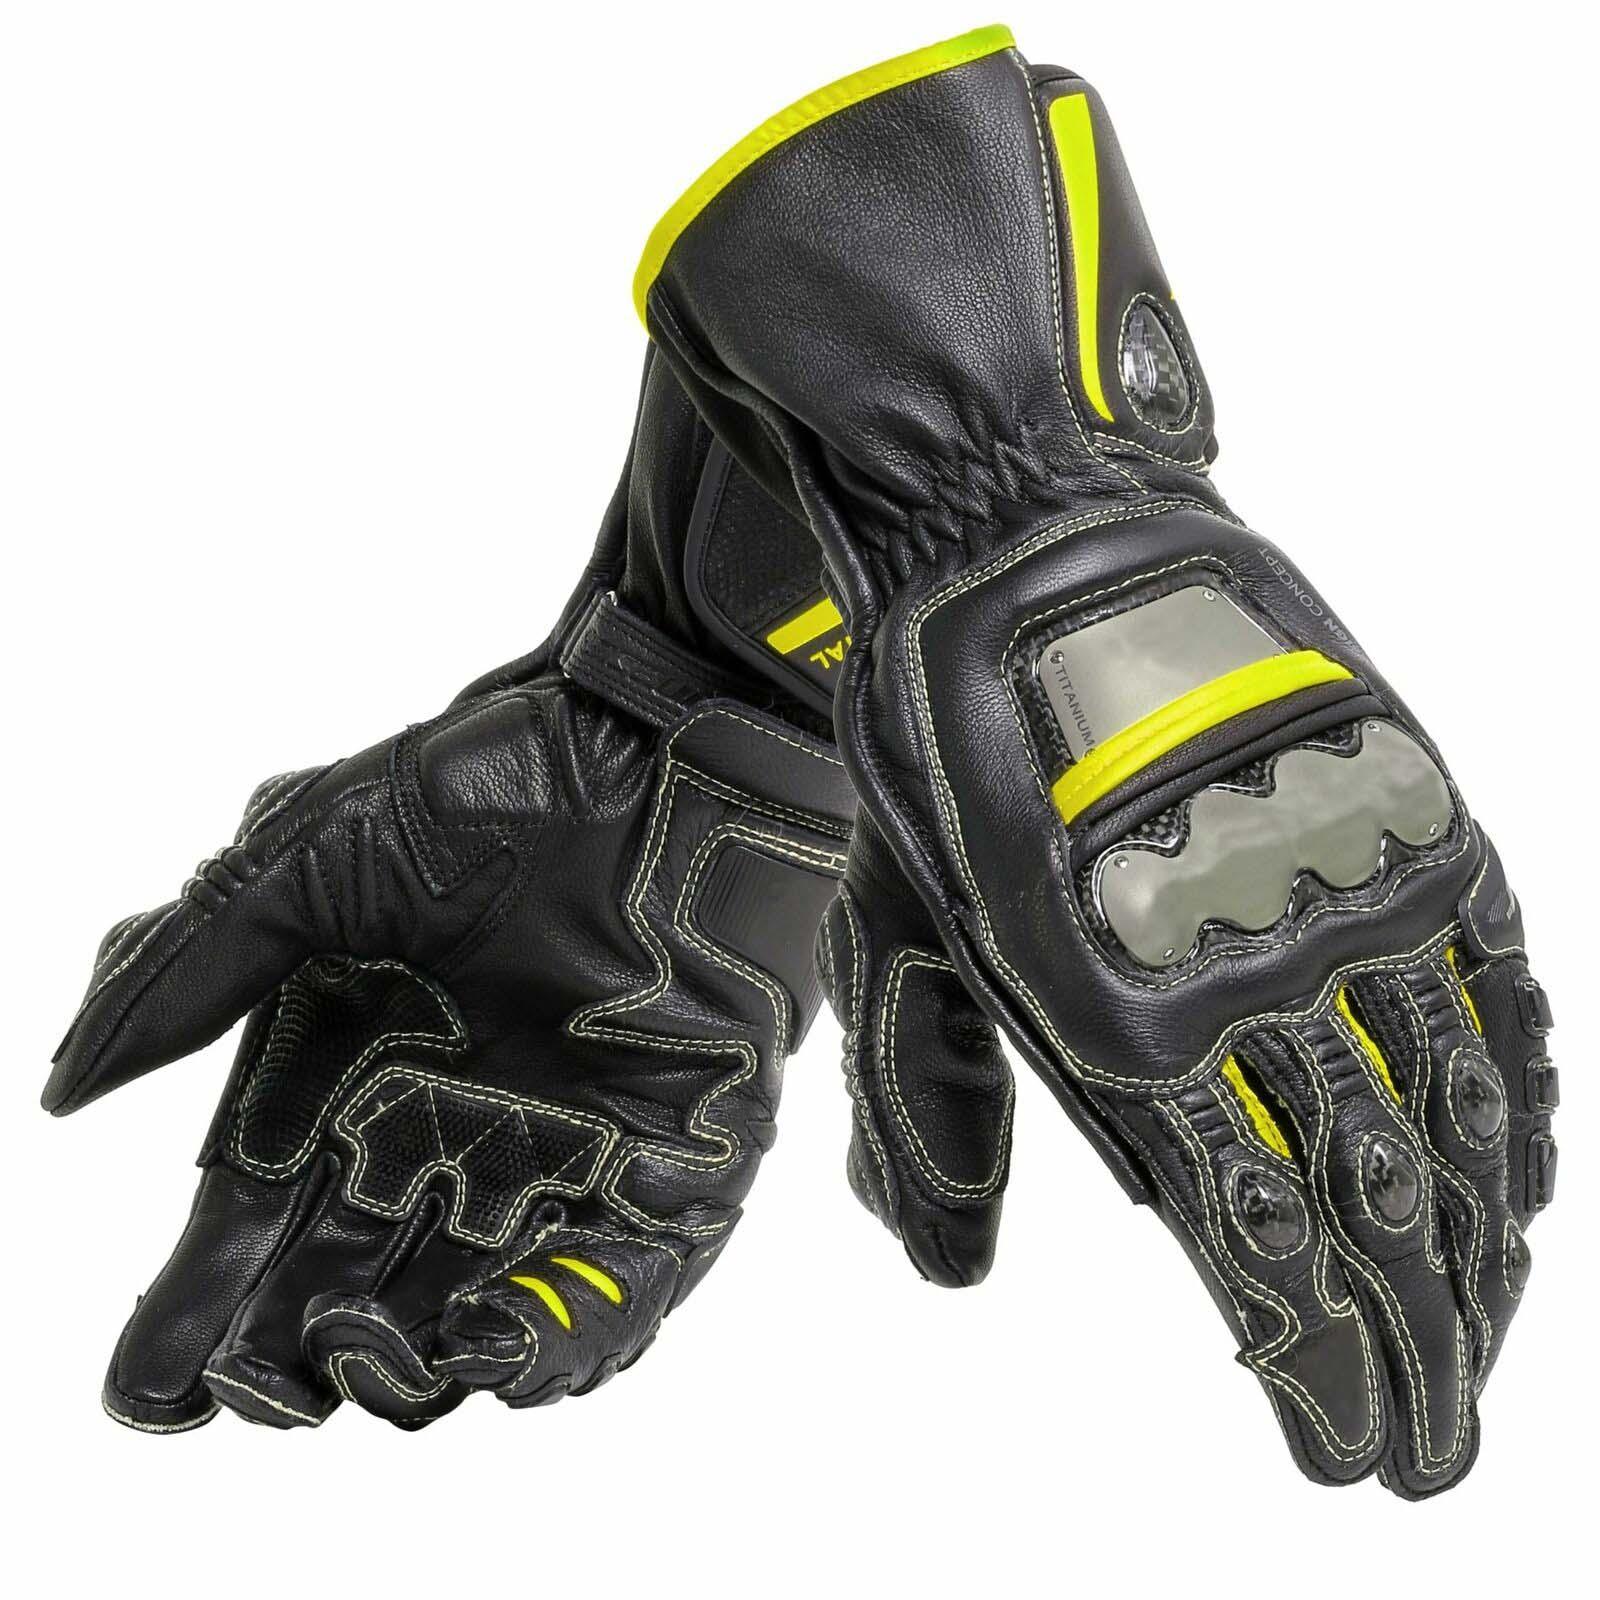 Hot Sell Dain Full Metal 6 Replica Motorcycle Long Gloves Anti Fall Titanium Motorbike Gloves REPLICA D1 Racing Gloves